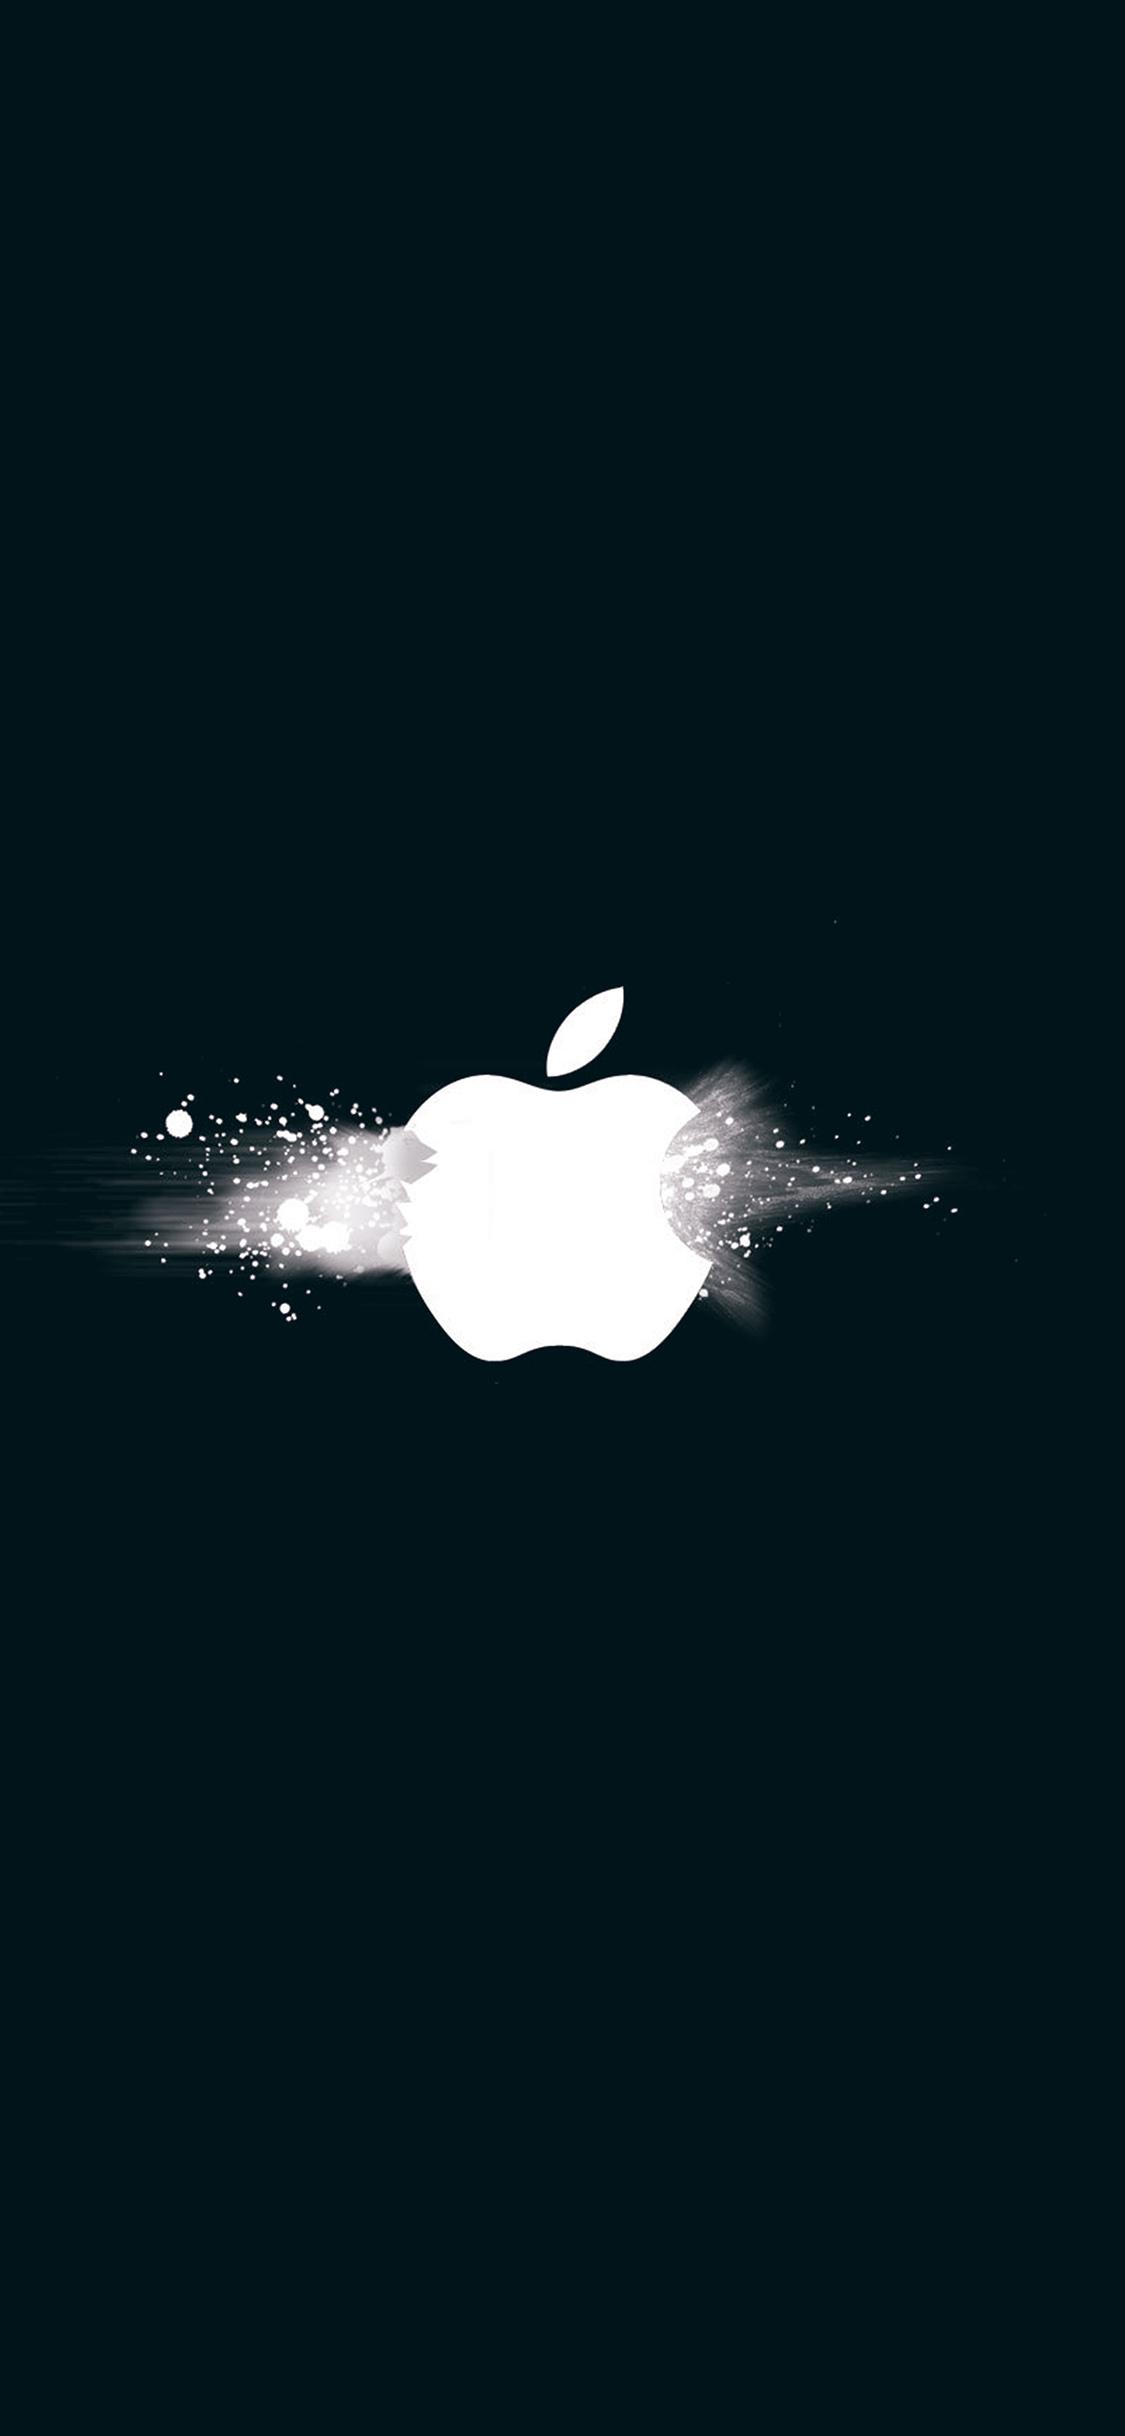 iPhonexpapers.com-Apple-iPhone-wallpaper-ay47-apple-logo-ihate-blue-minimal-illustration-art